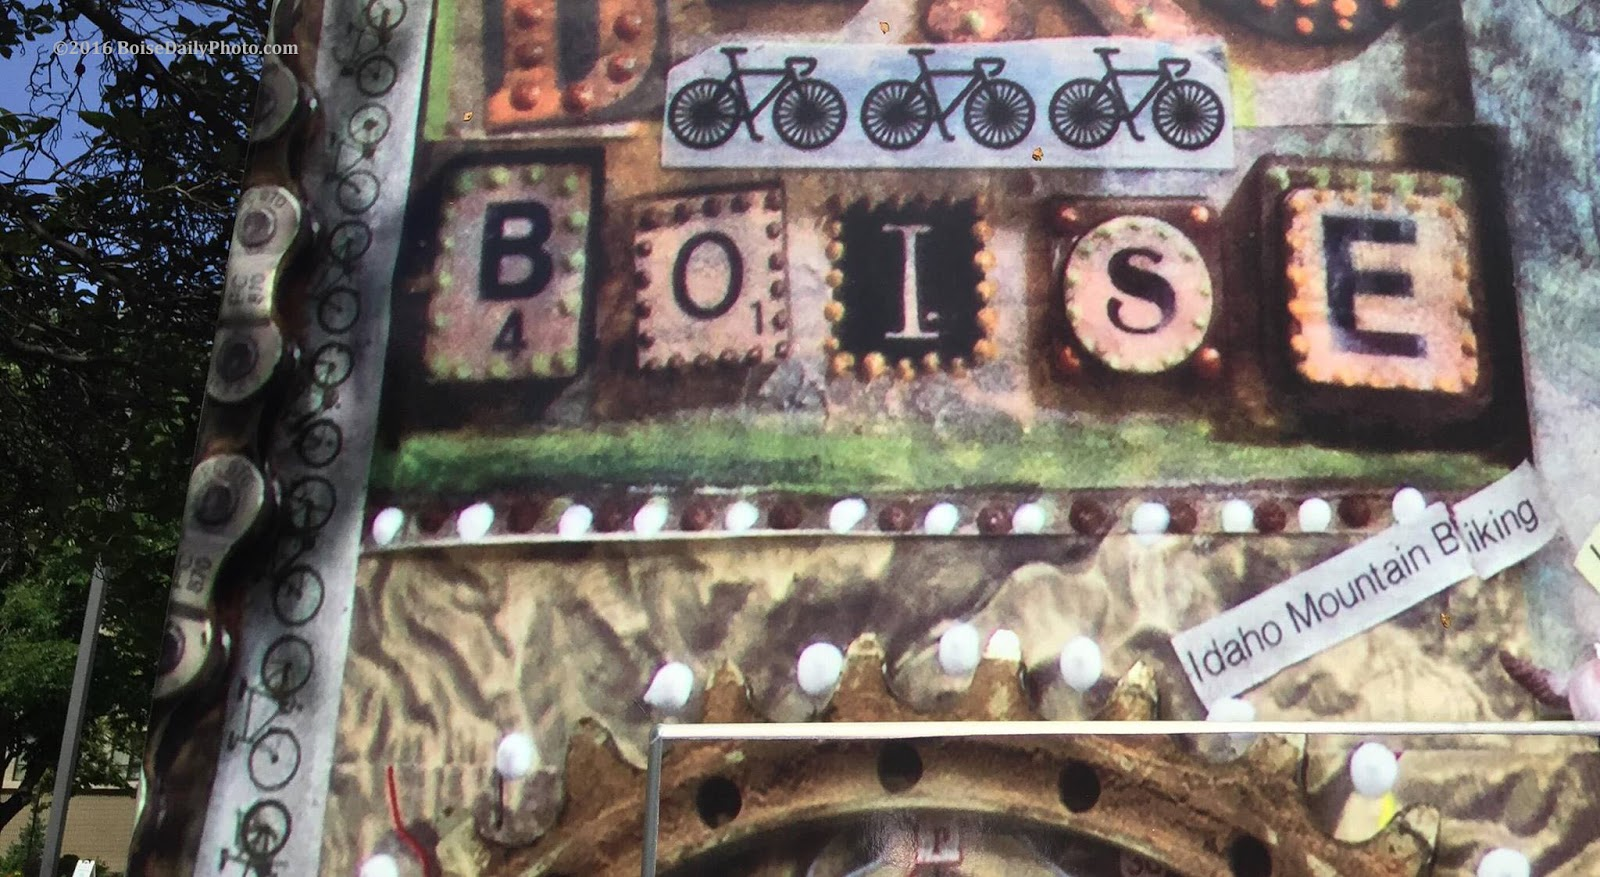 Boise Bicycle Art besides Ao Evo Atlantica Sora Kairi 116774208 additionally Fine Young Deviants also Trc And Xxxholic Mokona Twins 376808886 together with Watch. on anime oasis boise idaho